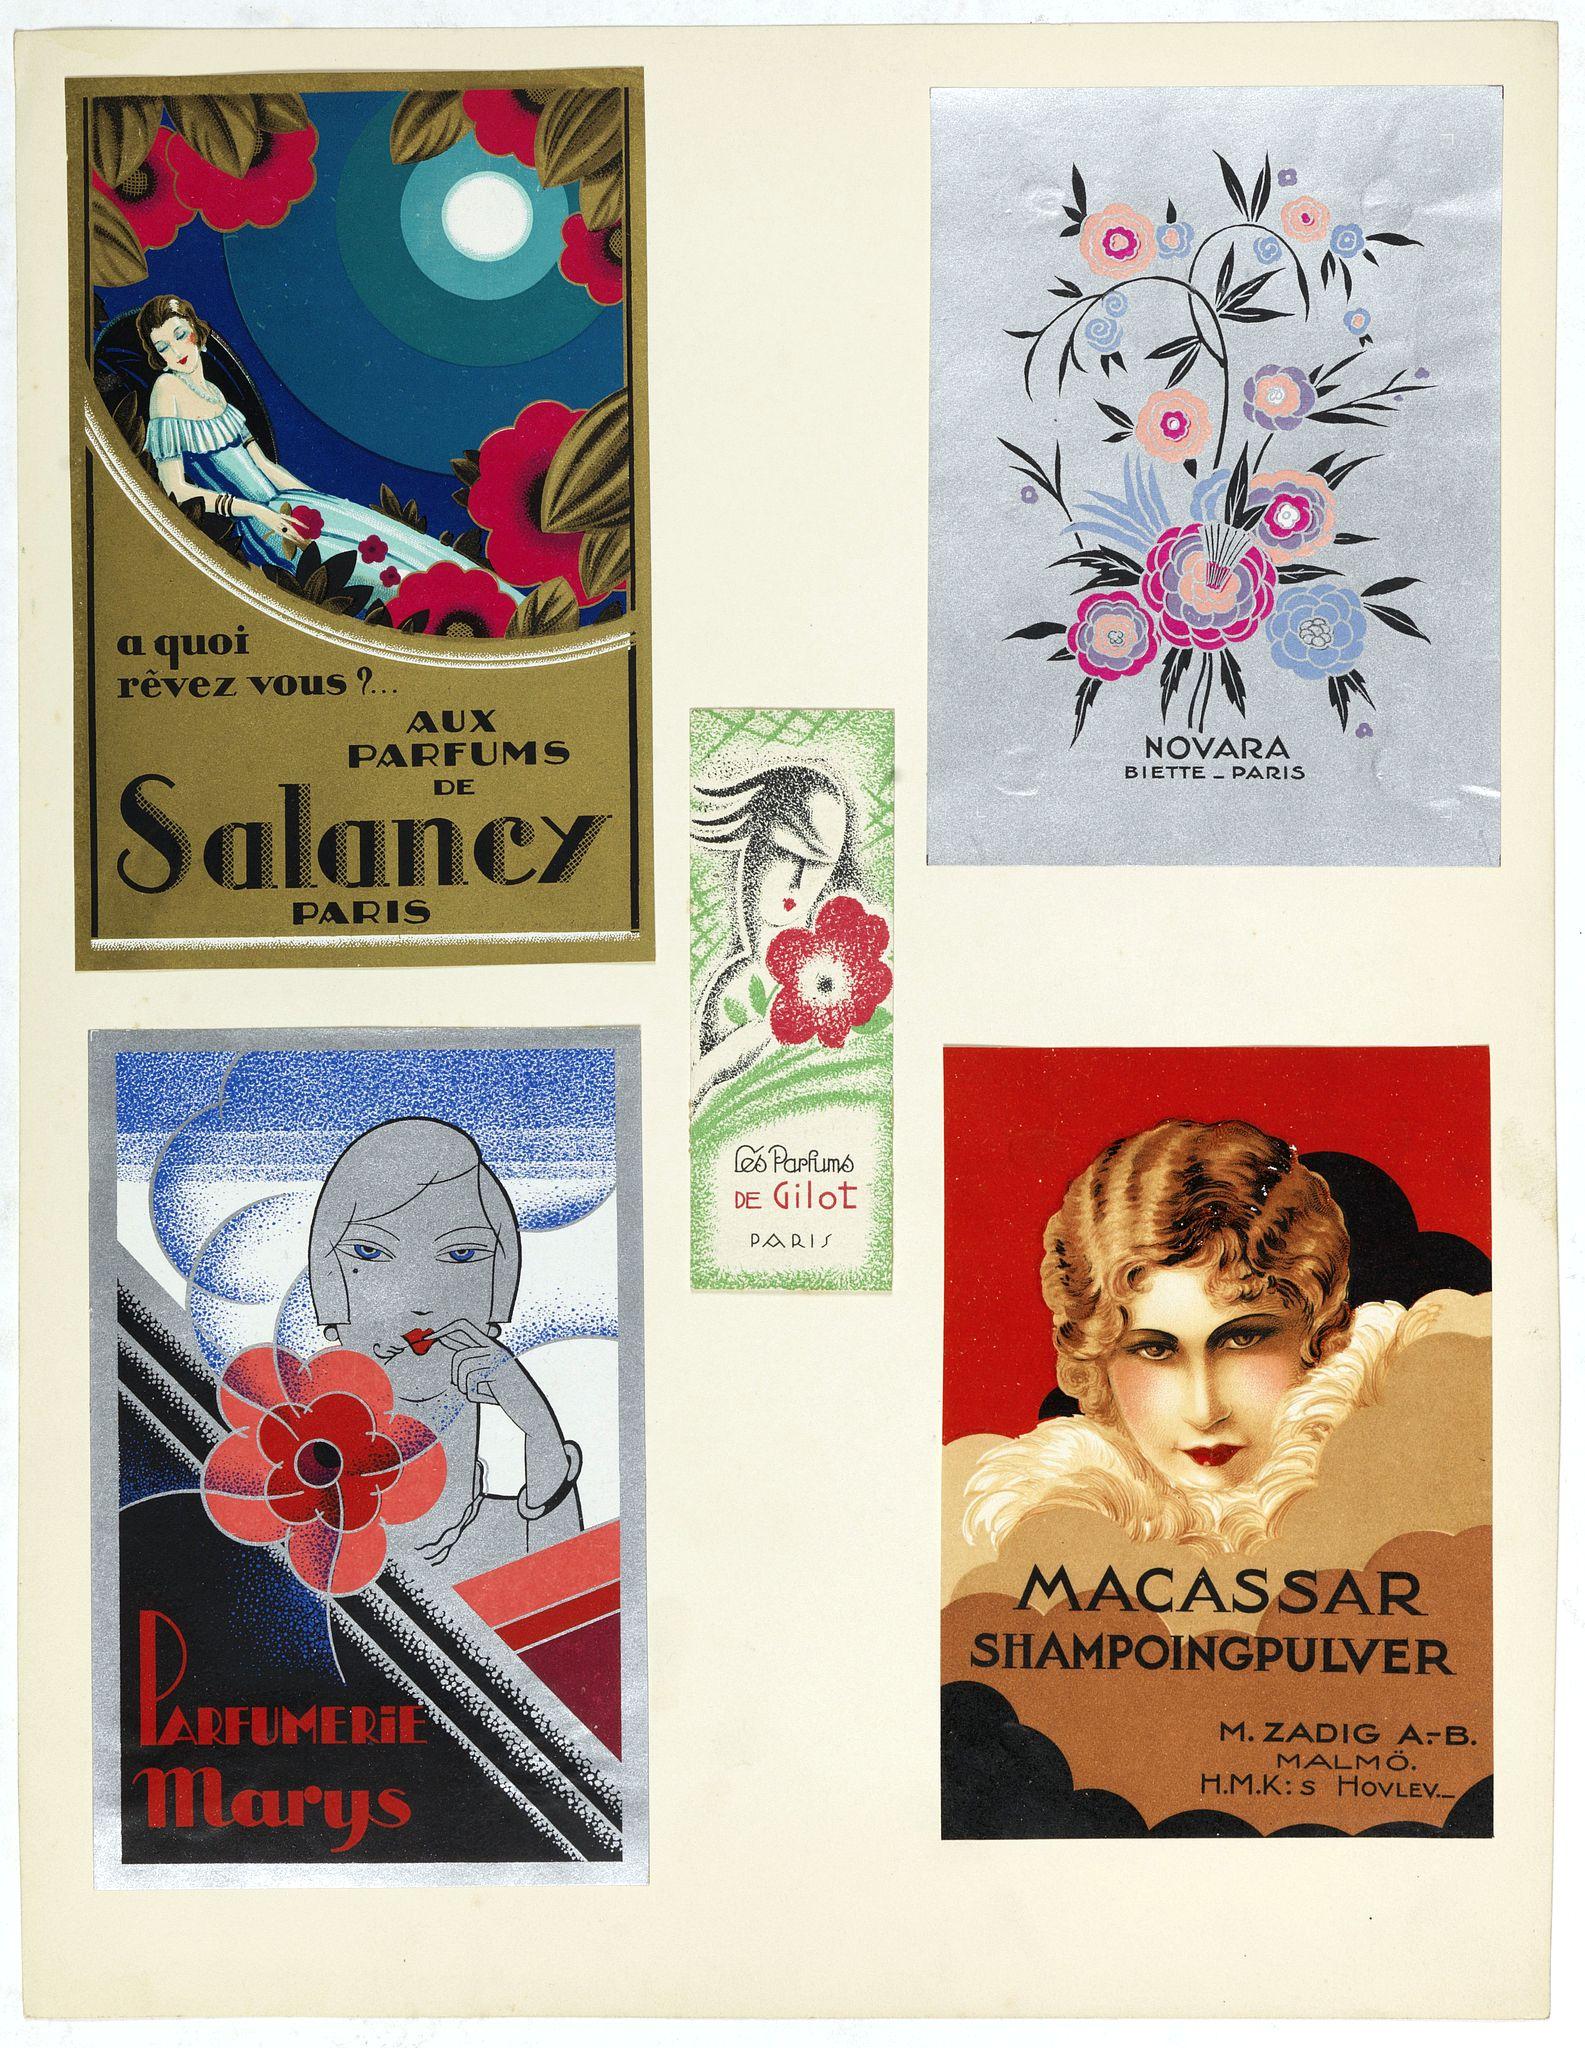 PICHON, Robert (Workshop). -  Five Art déco labels for Salancy, Novara, Parfumerie Marijs, M.Zadig, Paris.